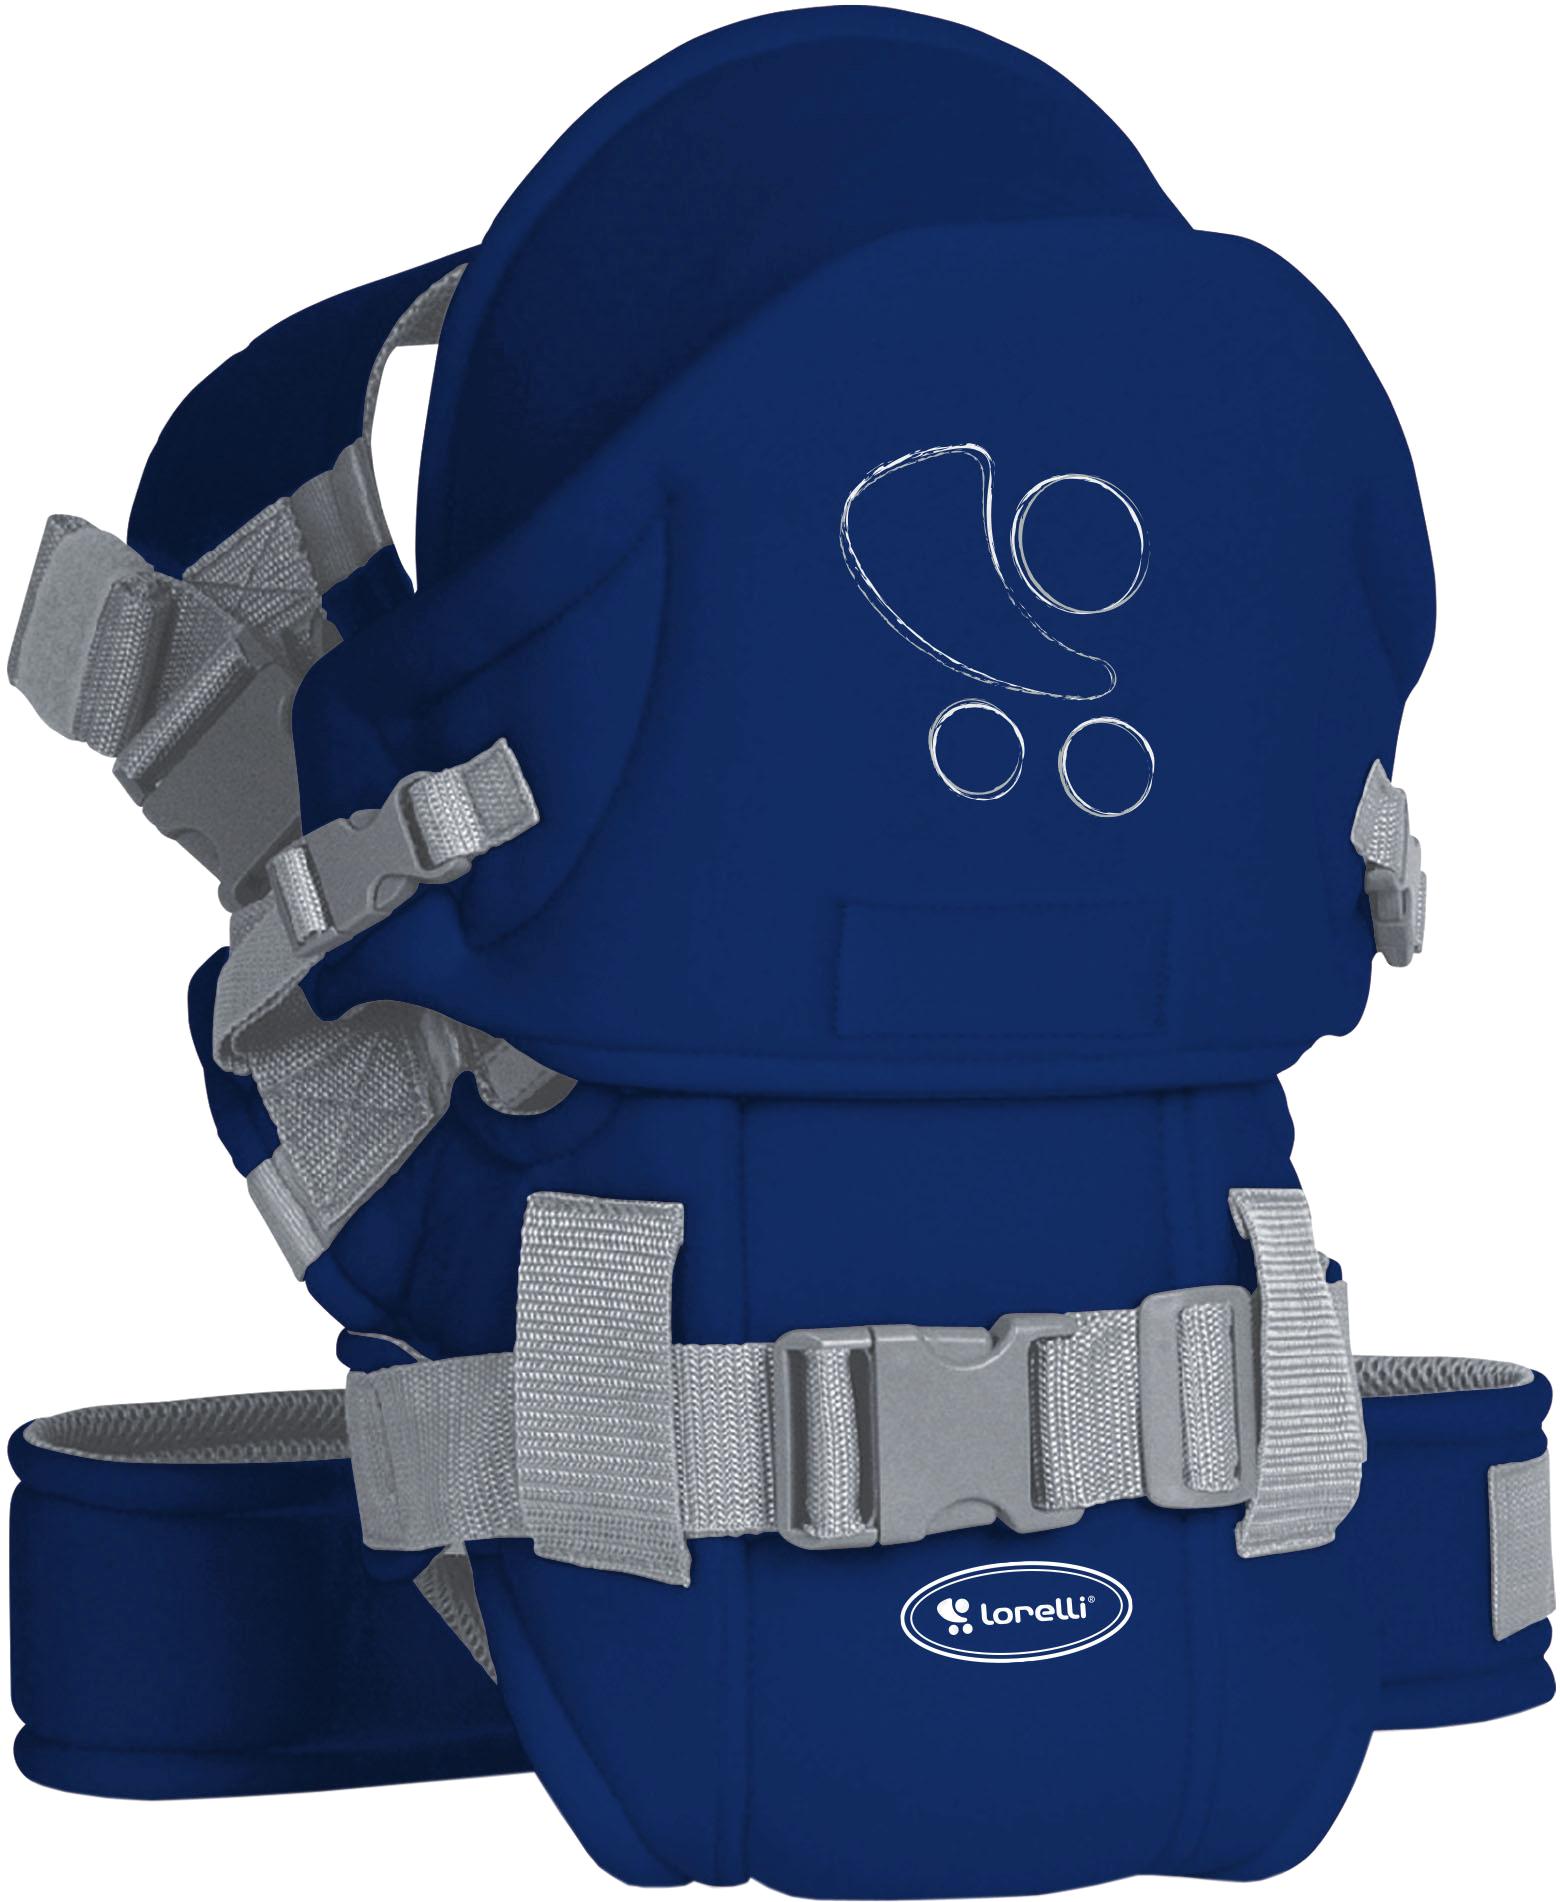 Traveller Comfort Blue 21vek.by 386000.000